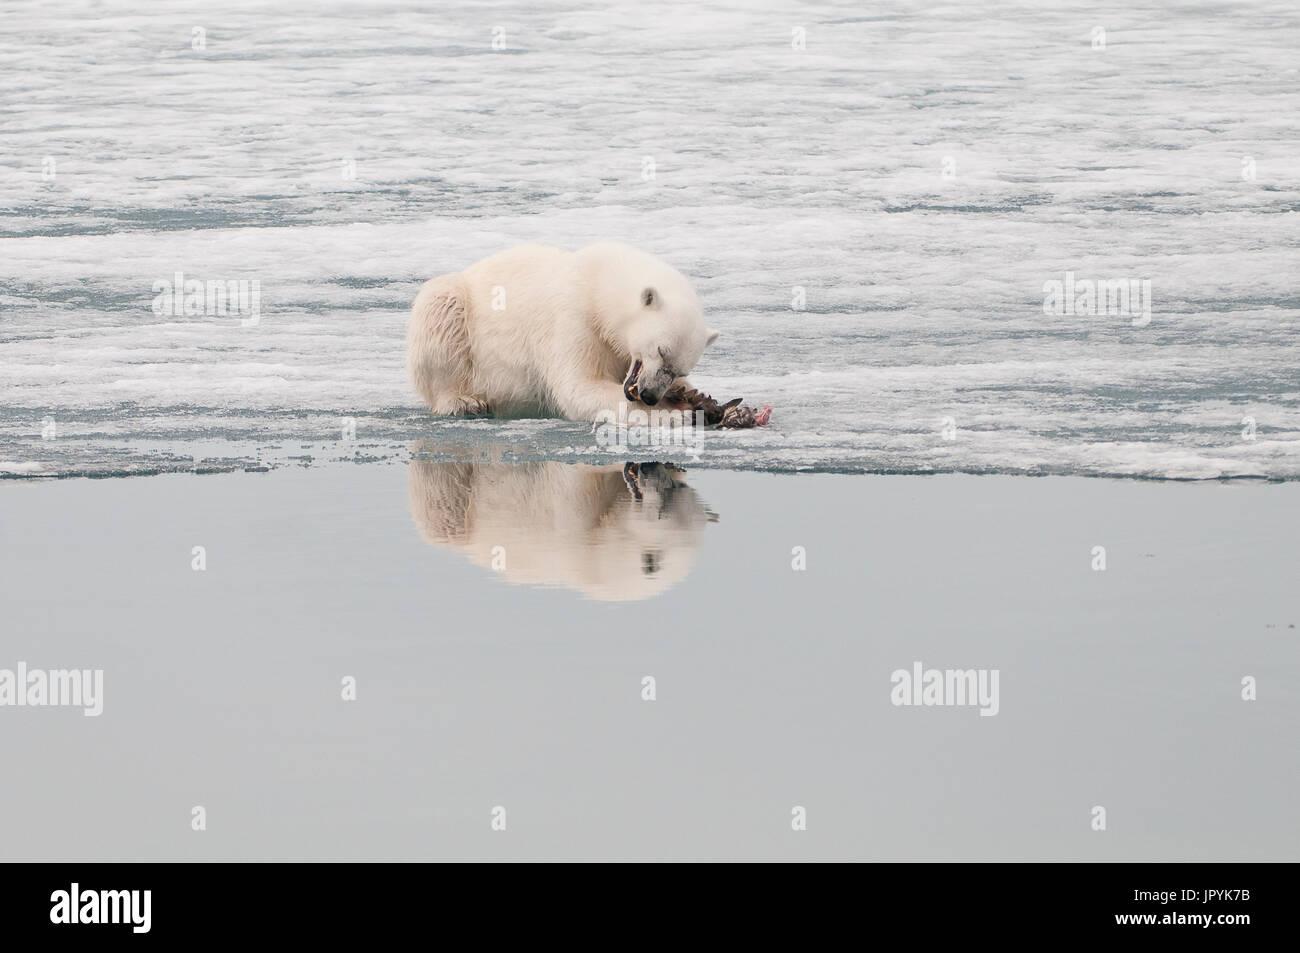 Polar bear eating a bird on the ice - Spitsbergen - Stock Image